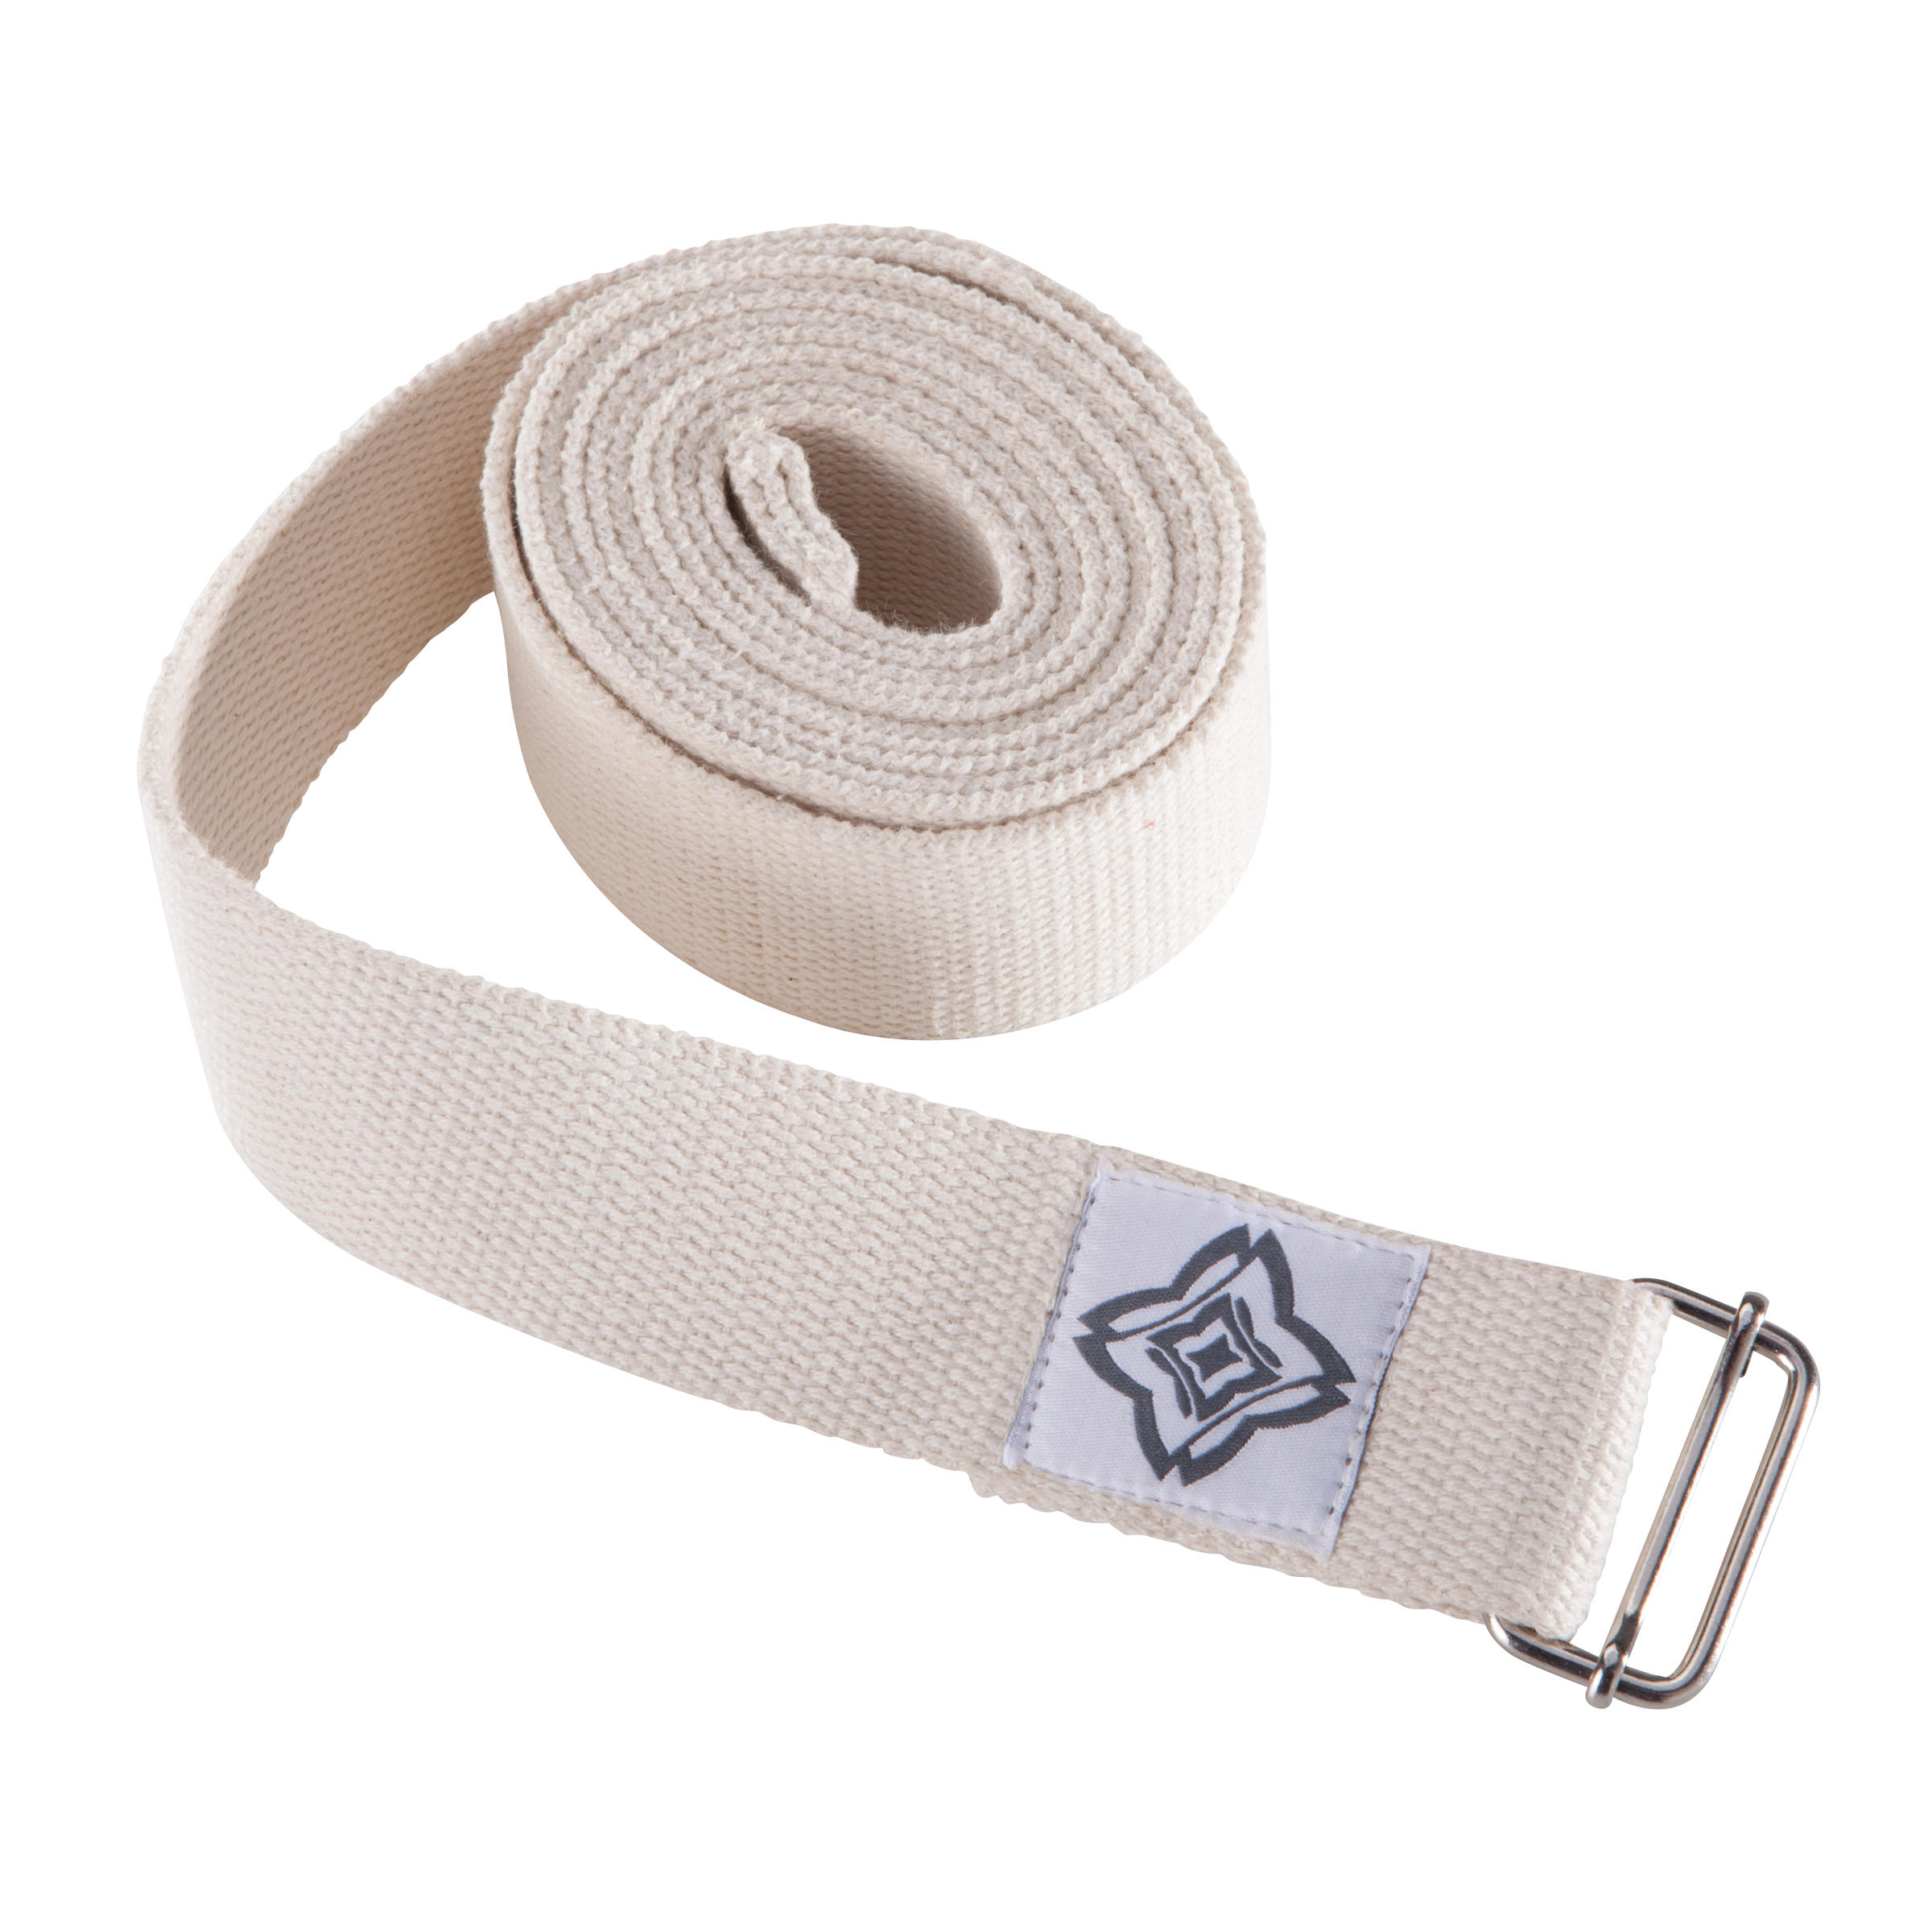 Correa de yoga de algodón crudo